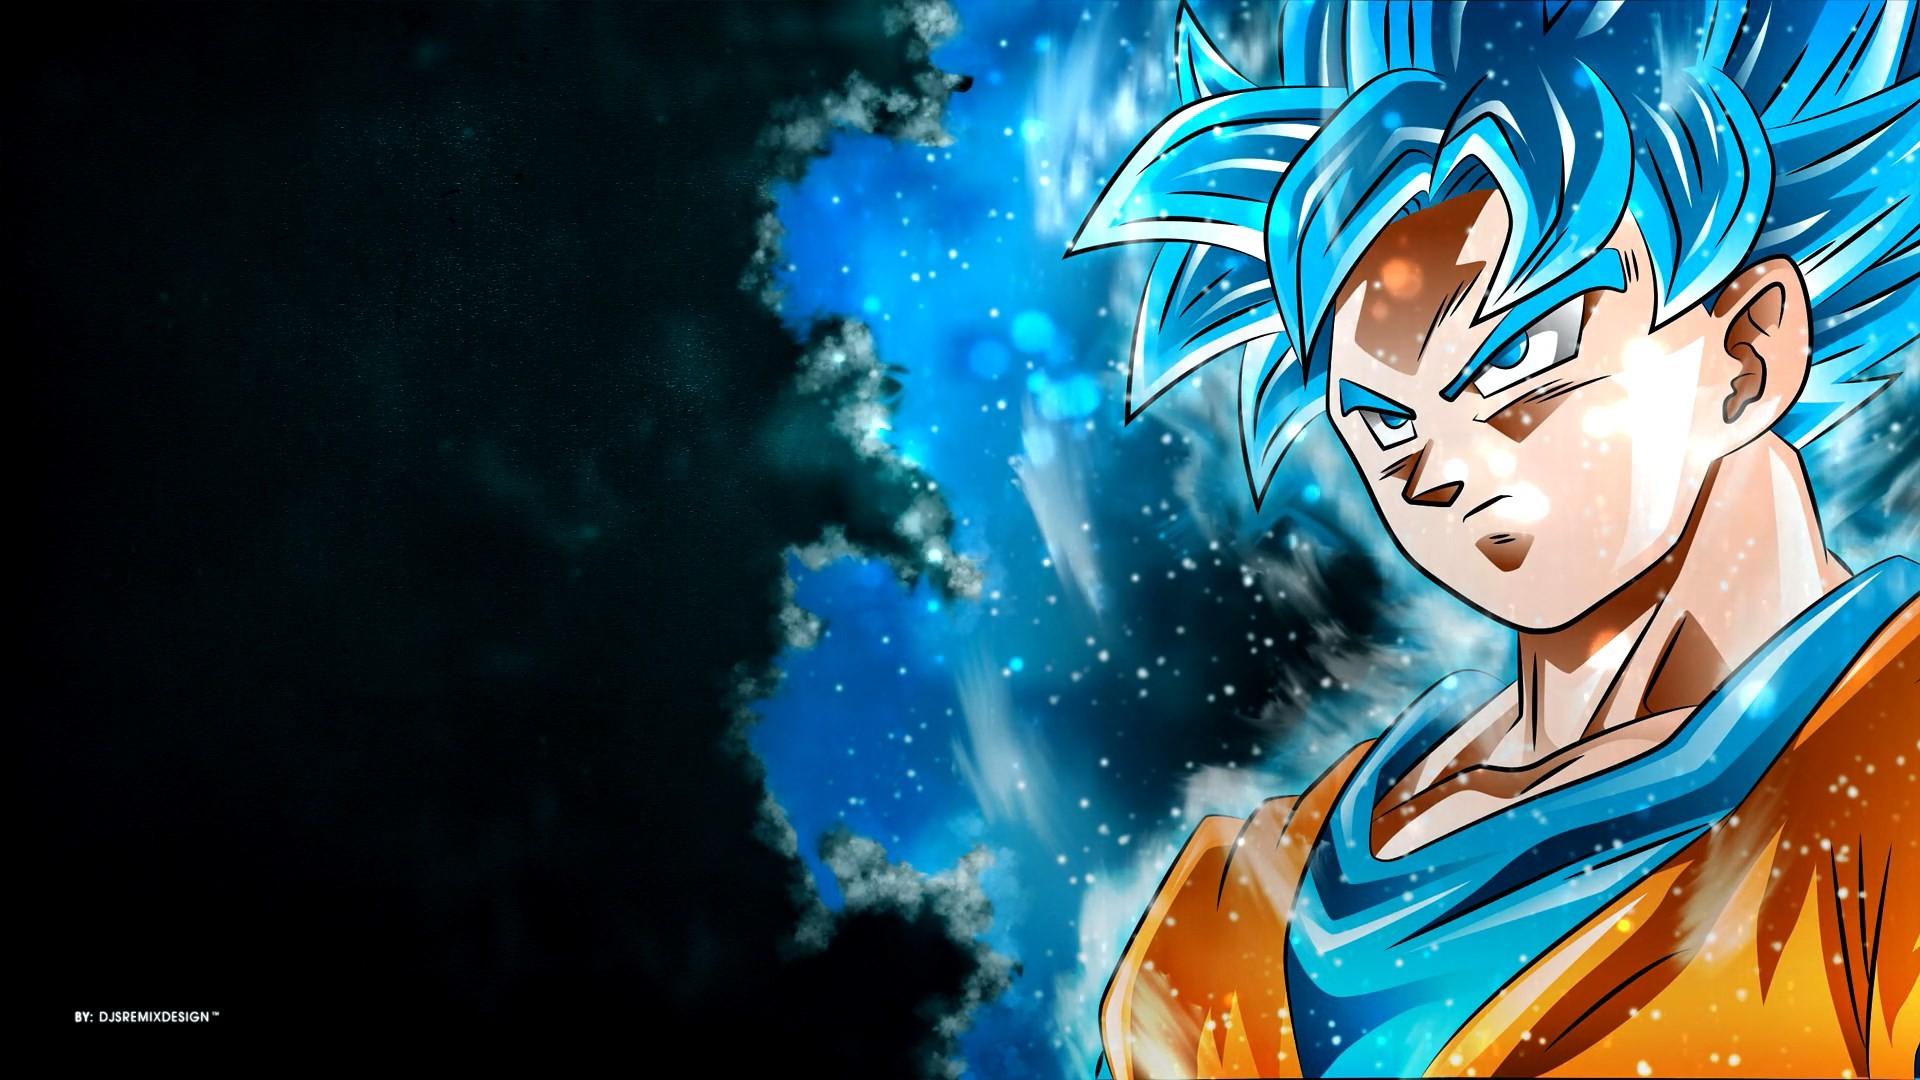 Goku Wallpapers (64+ images)